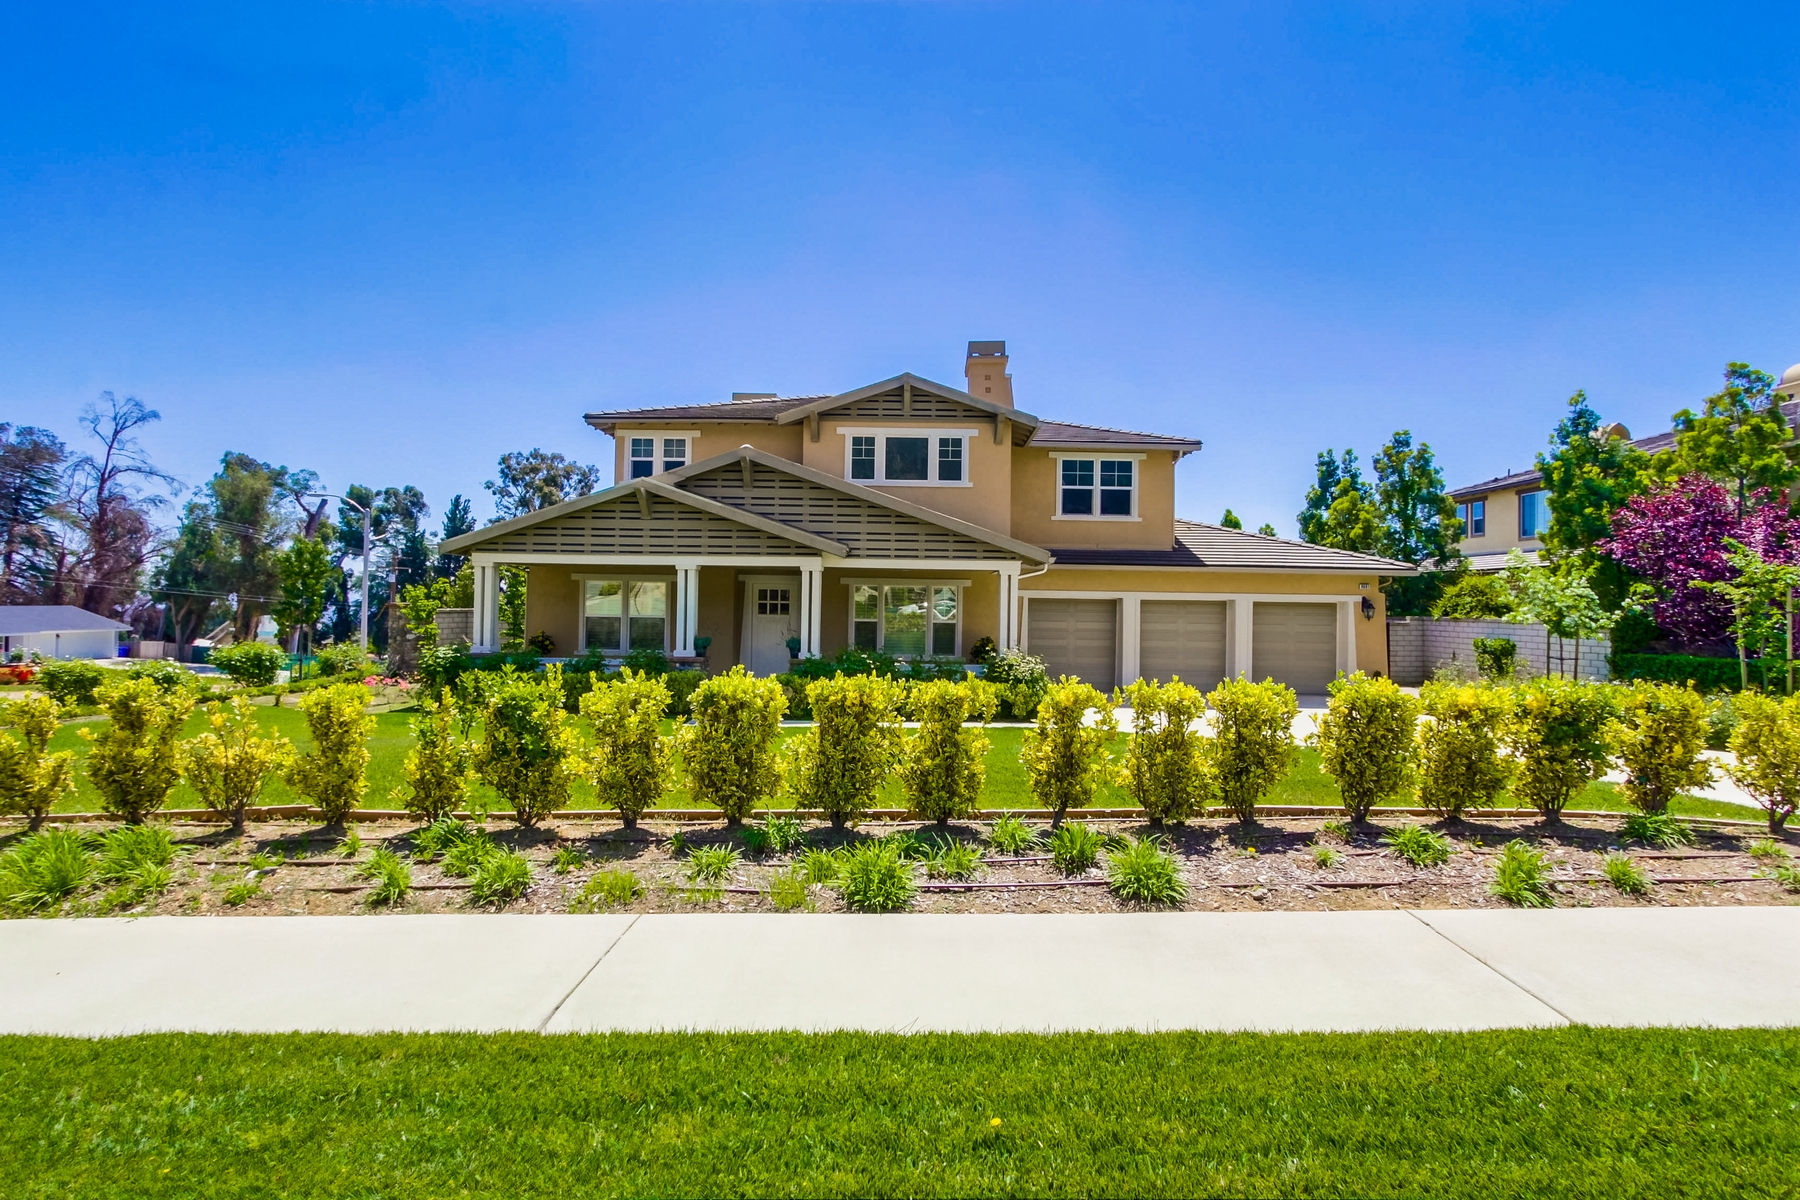 Propriété à vendre Rancho Cucamonga